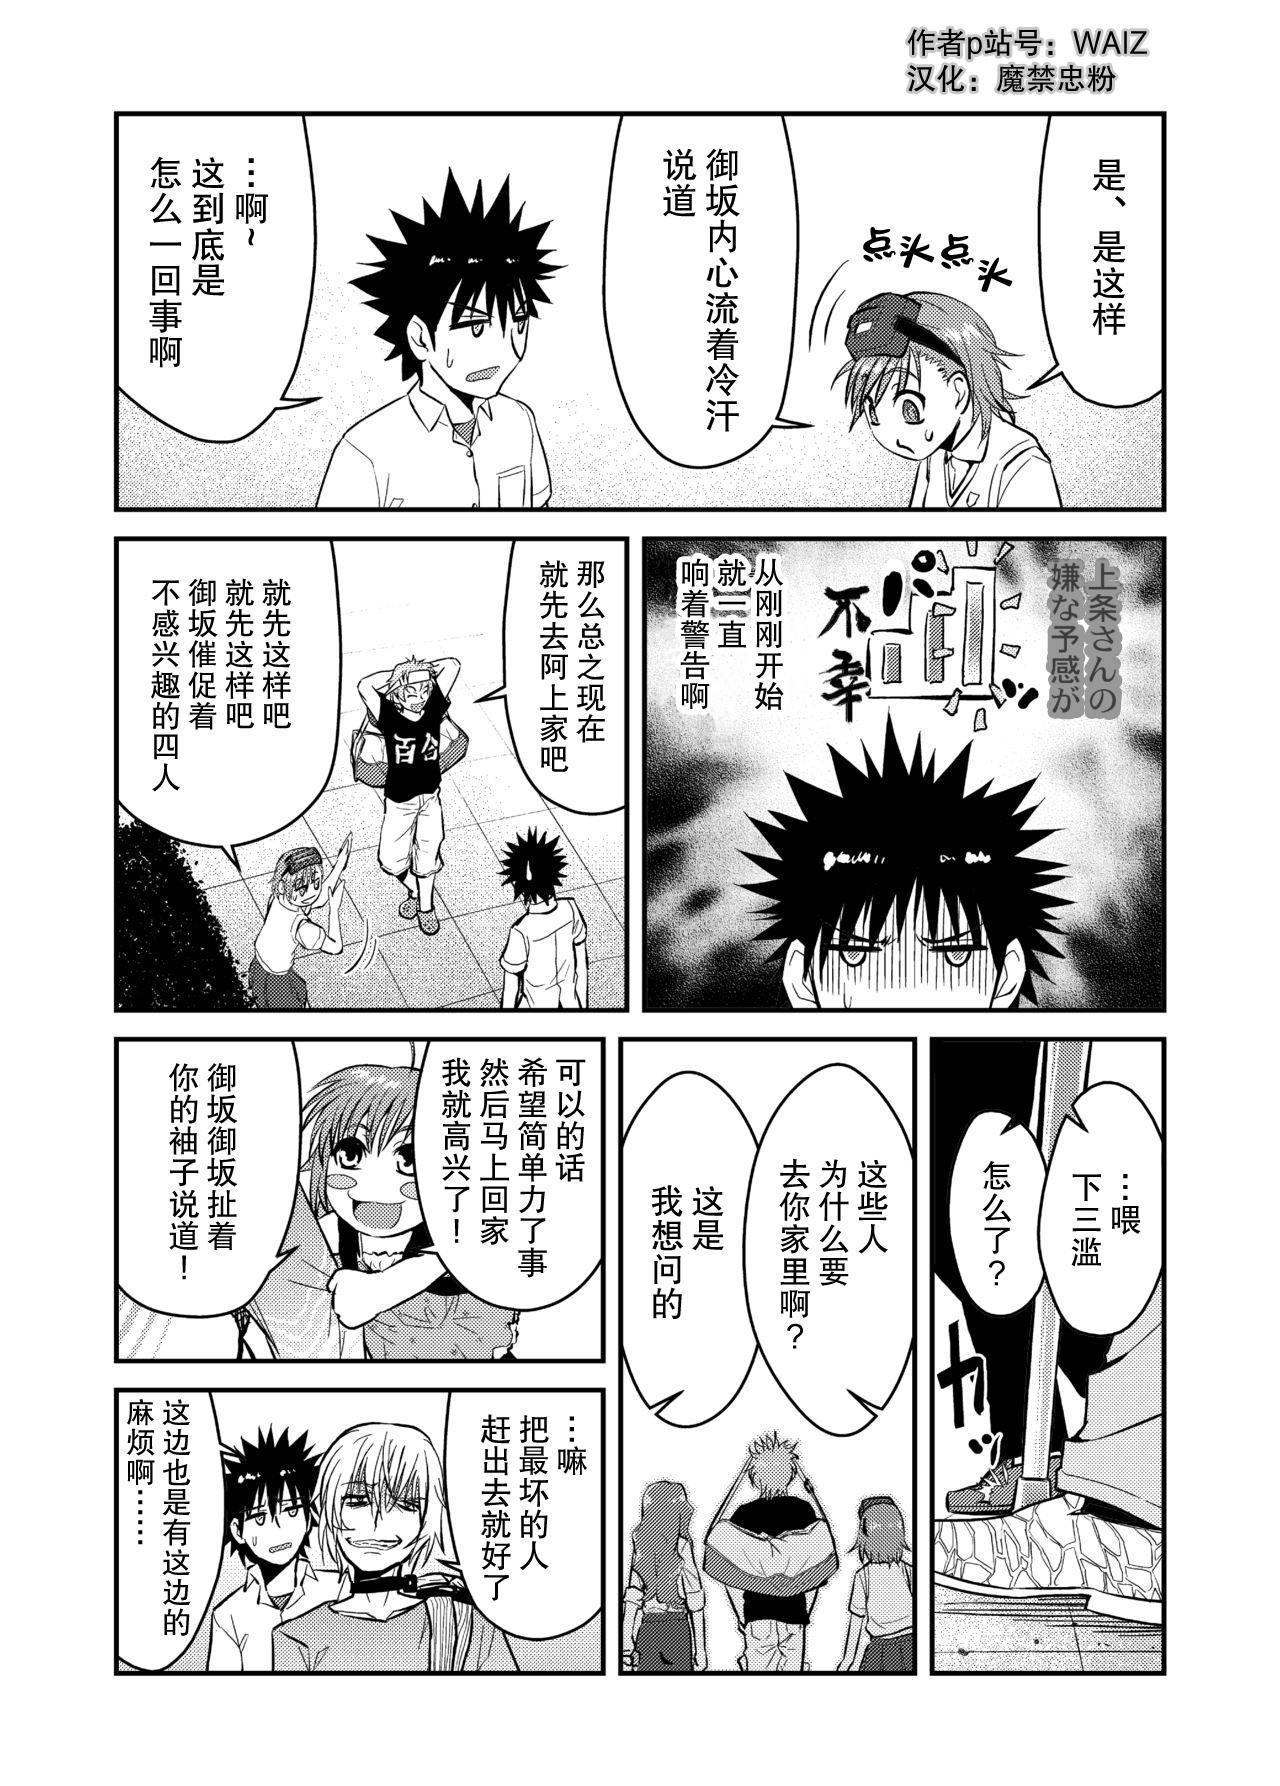 [WAIZ][同人个人渣汉化][就算是上条先生我家要住7个人还是太勉强了](Toaru Majutsu no Index) [中国翻译] 26